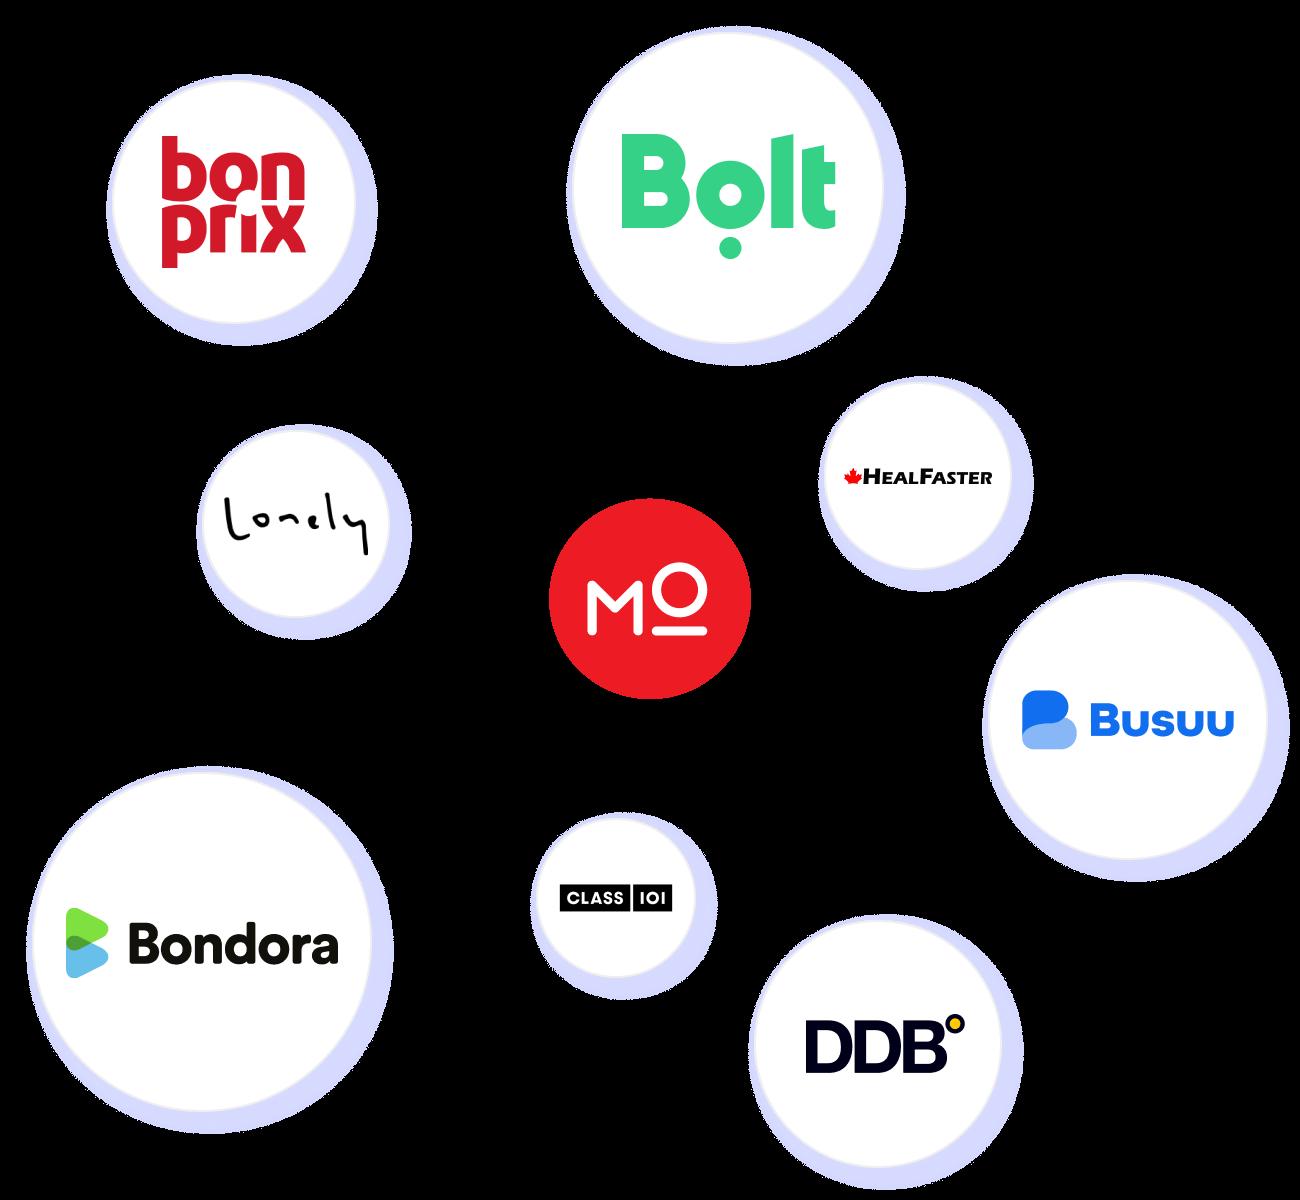 An illustrative image on Modash's customers